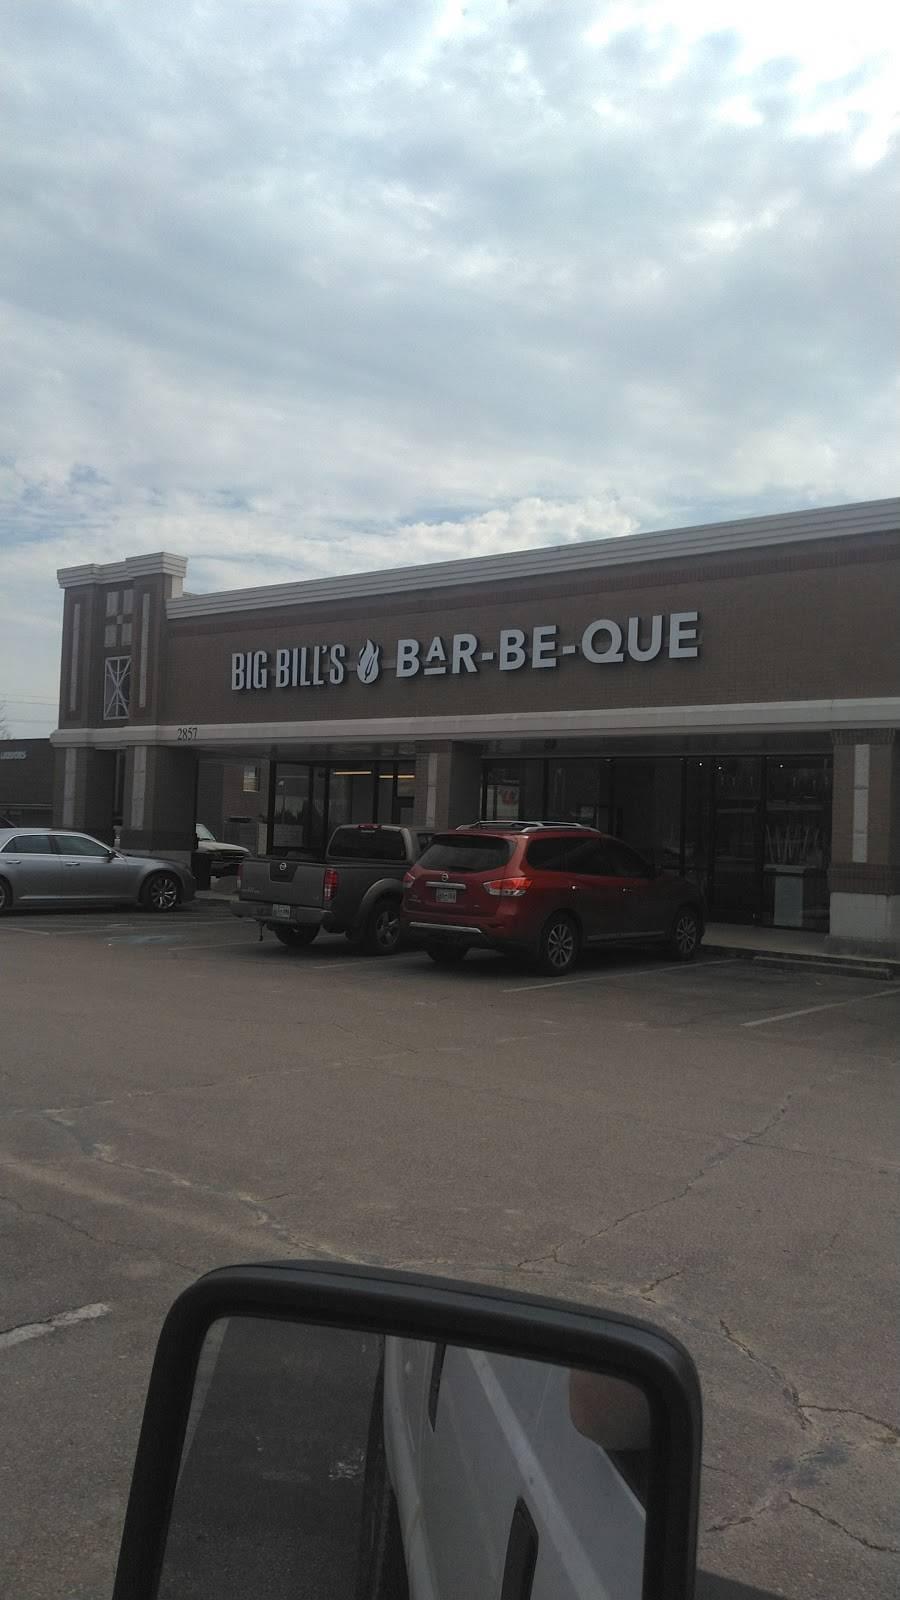 Big Bills Bar-Be-Que   restaurant   2857 Kirby Rd Suite 119, Memphis, TN 38119, USA   9015297798 OR +1 901-529-7798